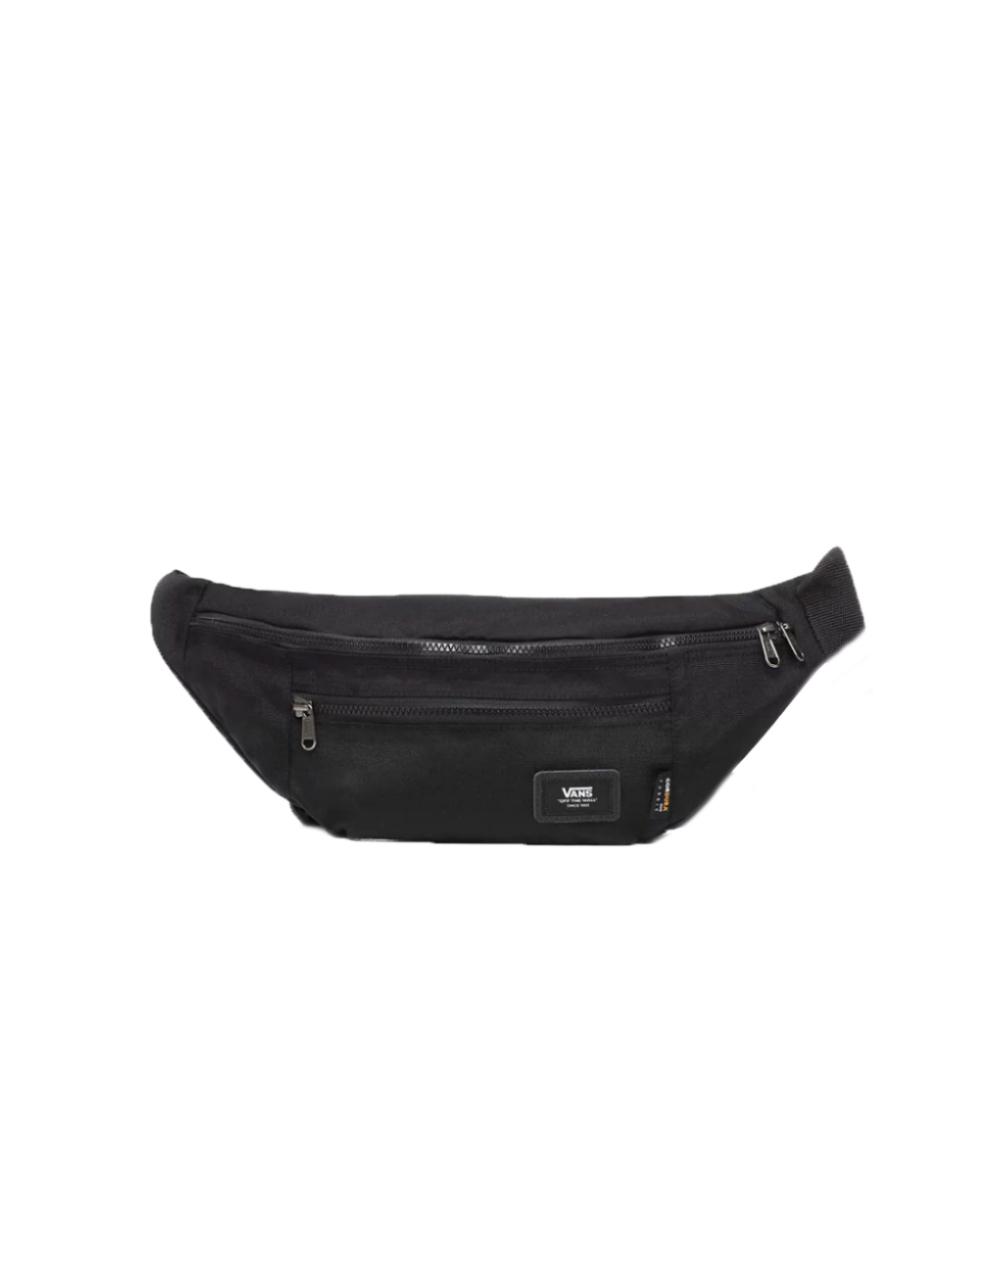 Vans Ward Cross Body Pack Cordura Fabric (VN0A2ZXX6ZC1) Black Ripstop